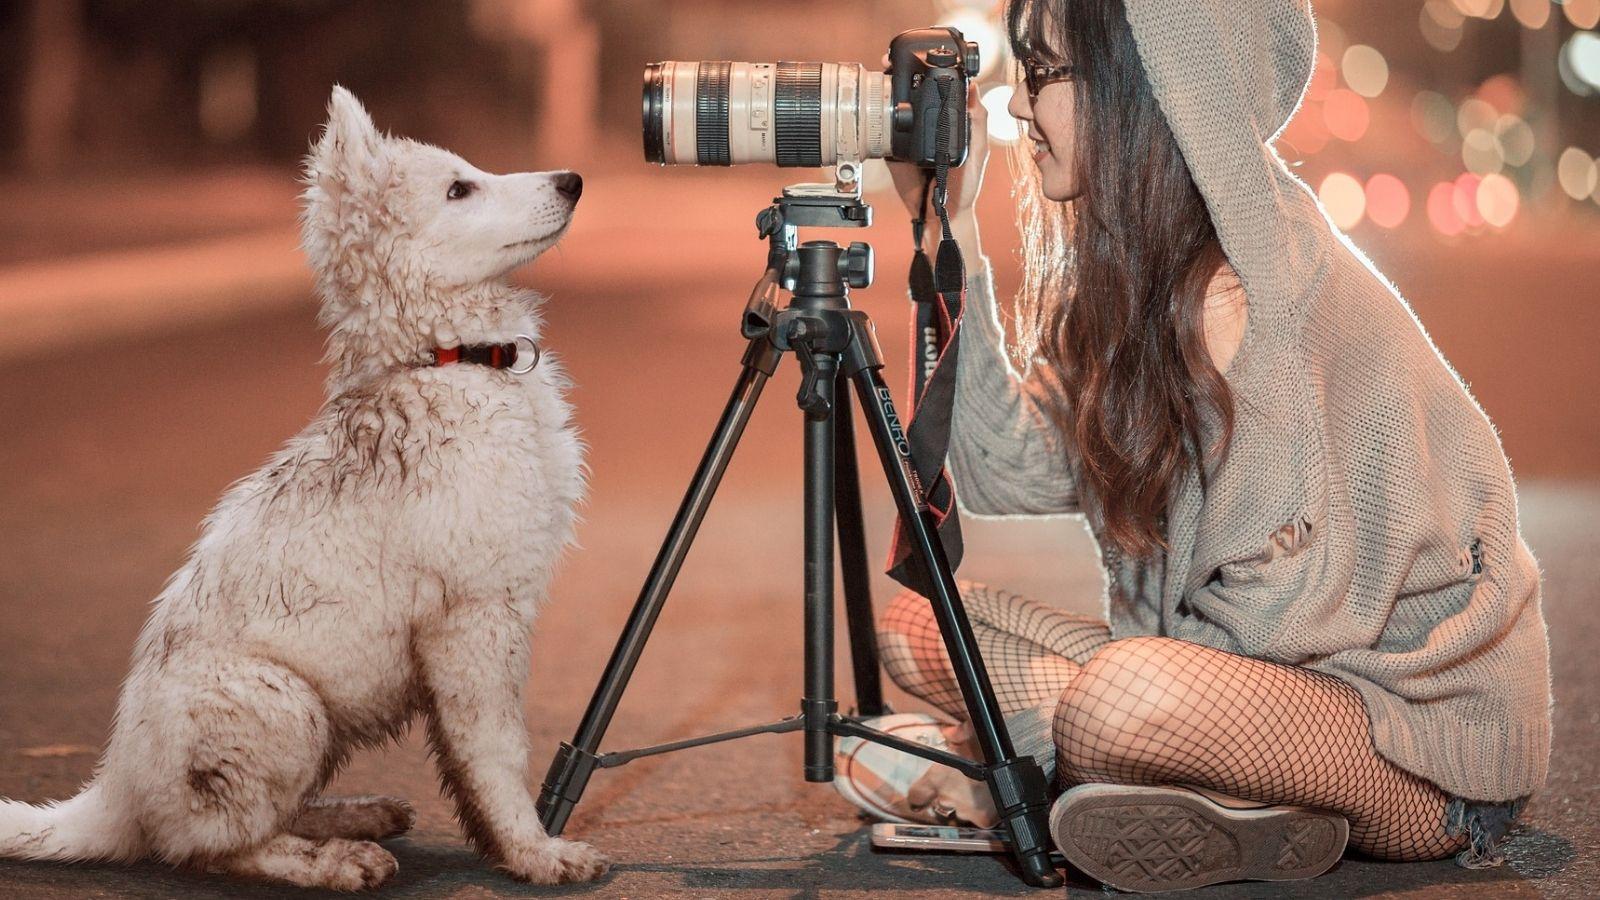 Censar a tu mascota y recoger sus excrementos nos beneficia a todos